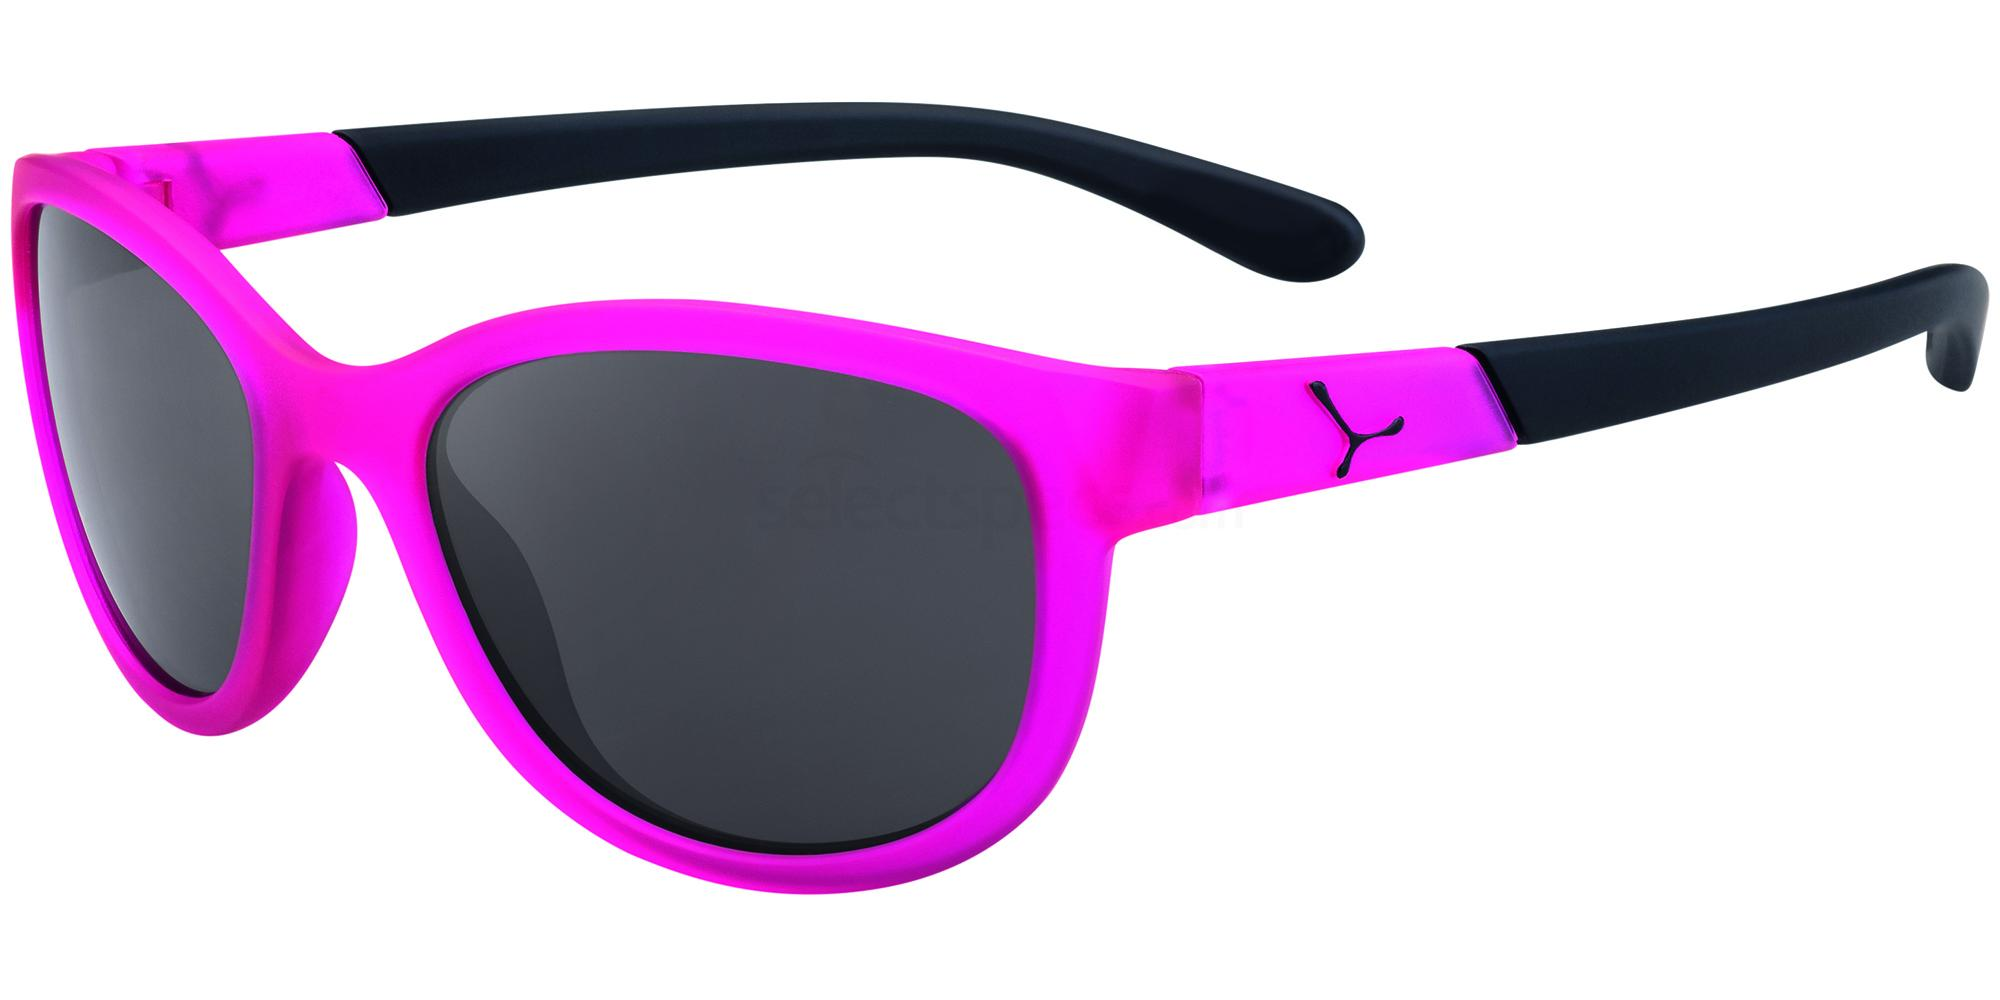 CBKAT1 Katniss (Age 7-10) Sunglasses, Cebe JUNIOR